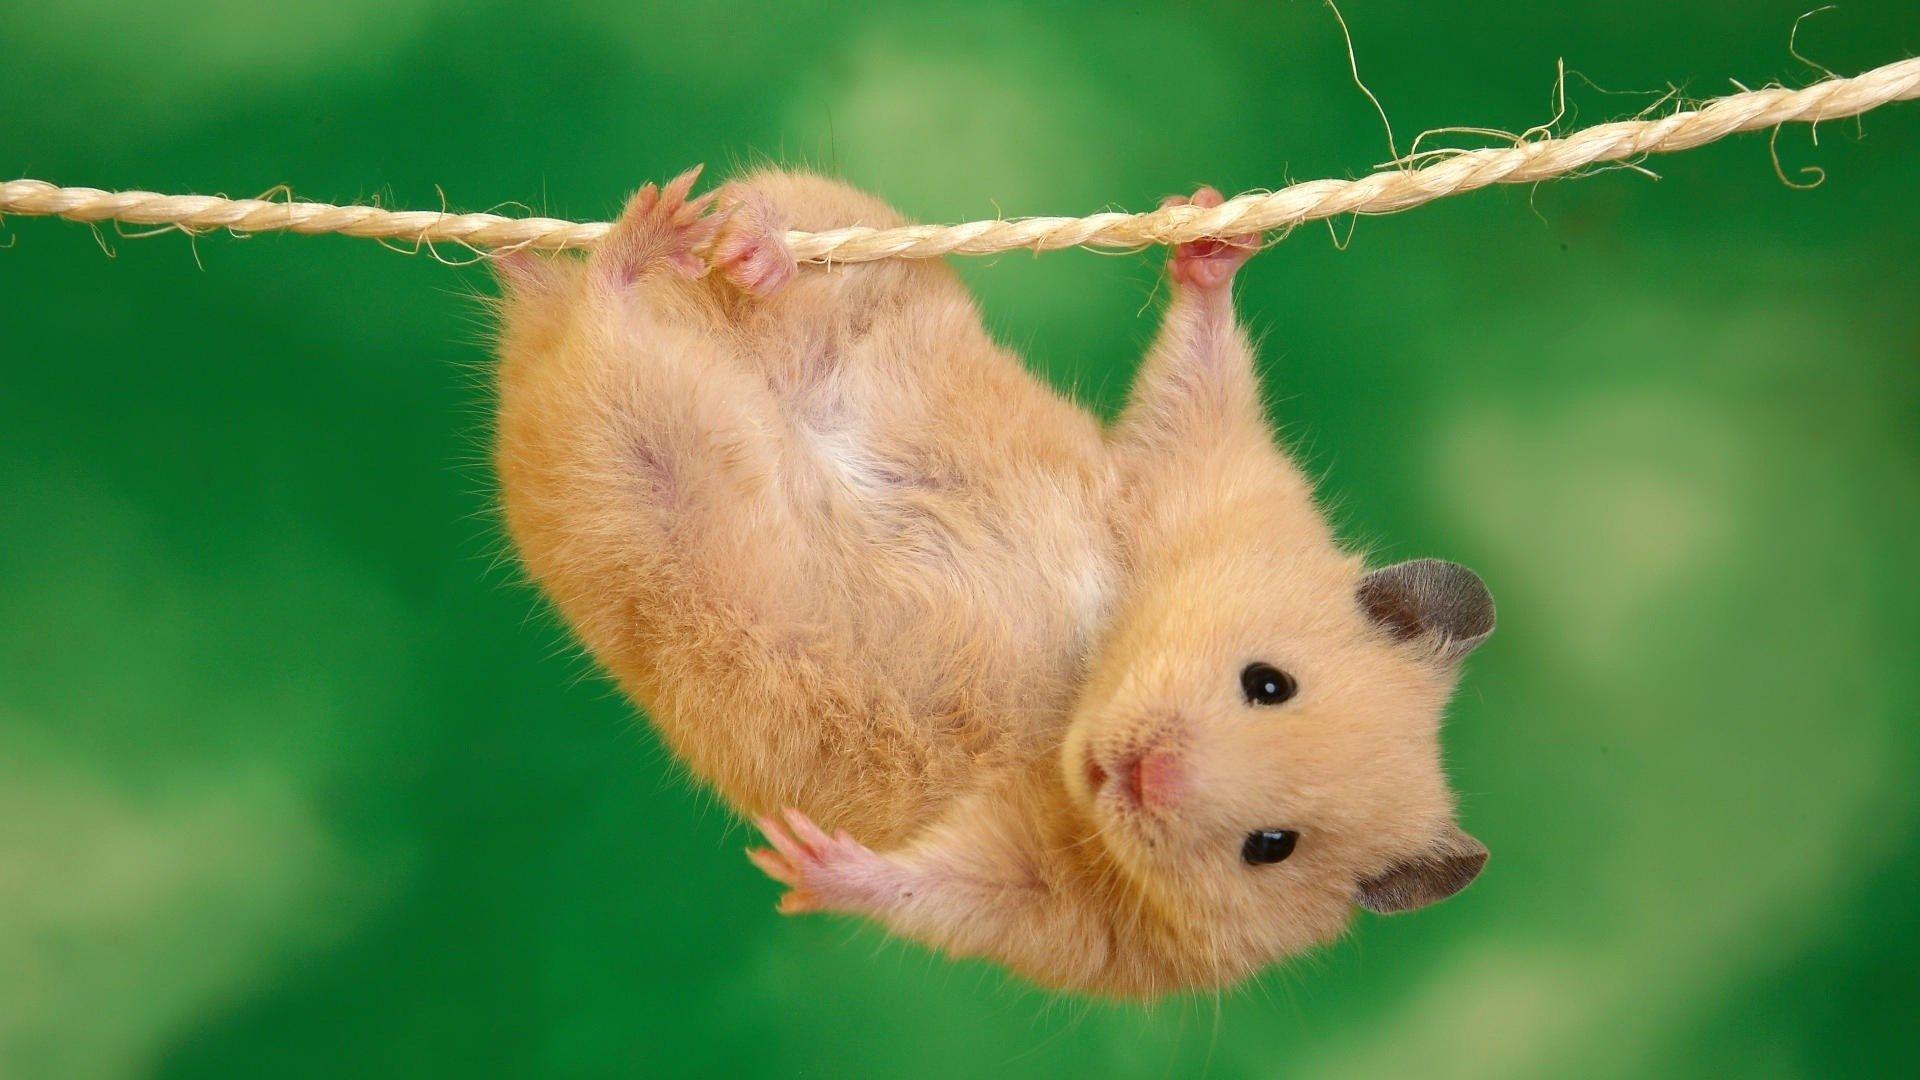 Cute Animal Hd Wallpaper Download Free Cute Animal Photos Funny Animal Photos Funny Hamsters